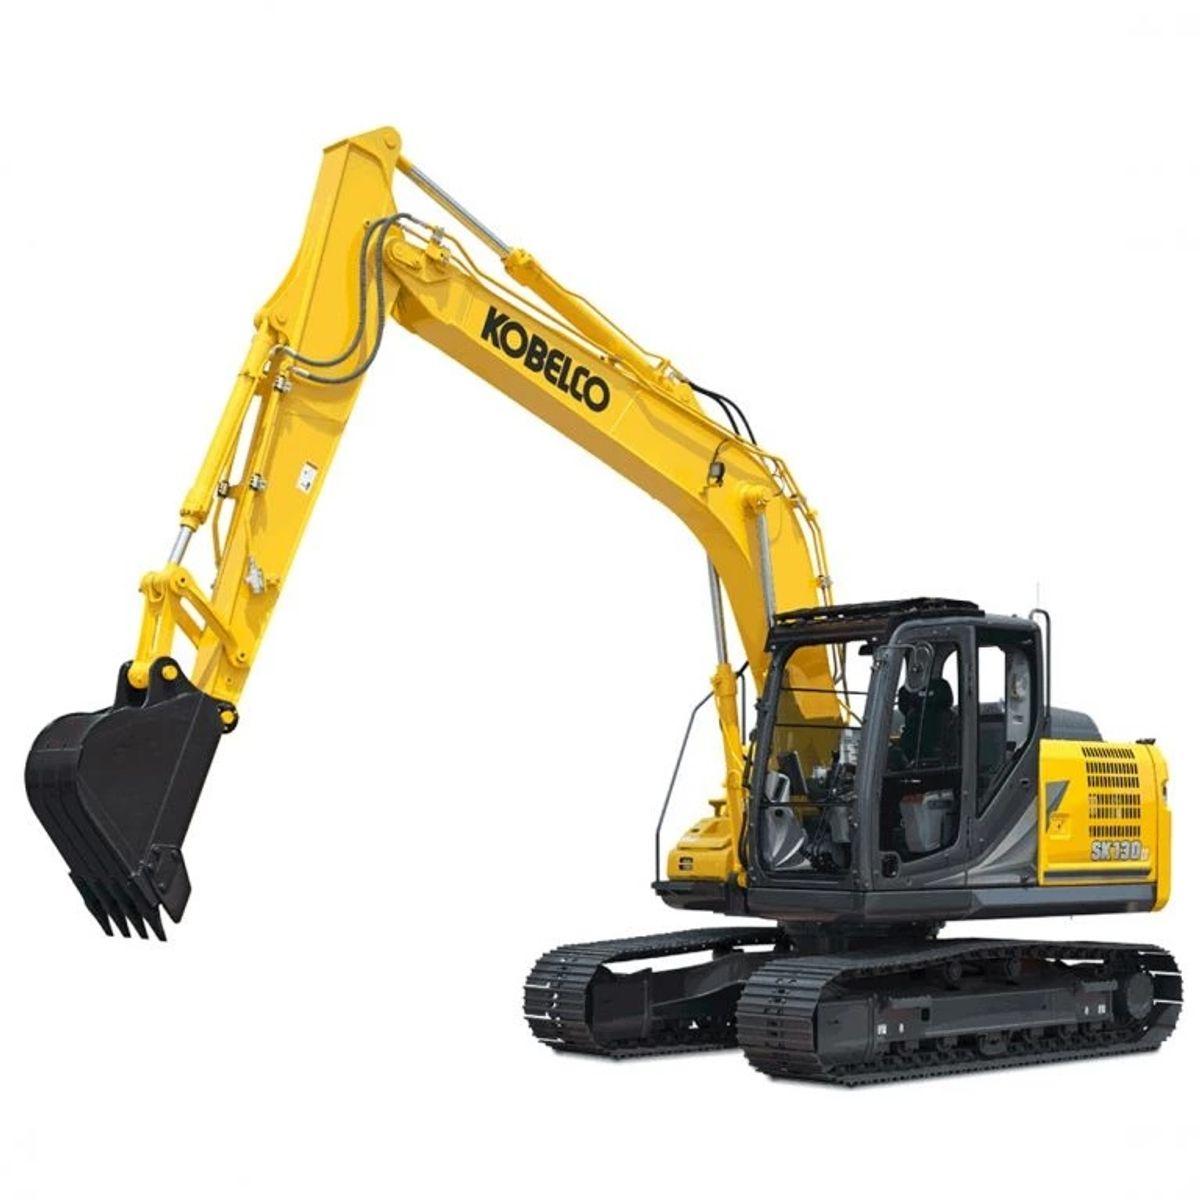 Kobelco's New SK130LC-11 Excavator the First in Next-Gen Lineup